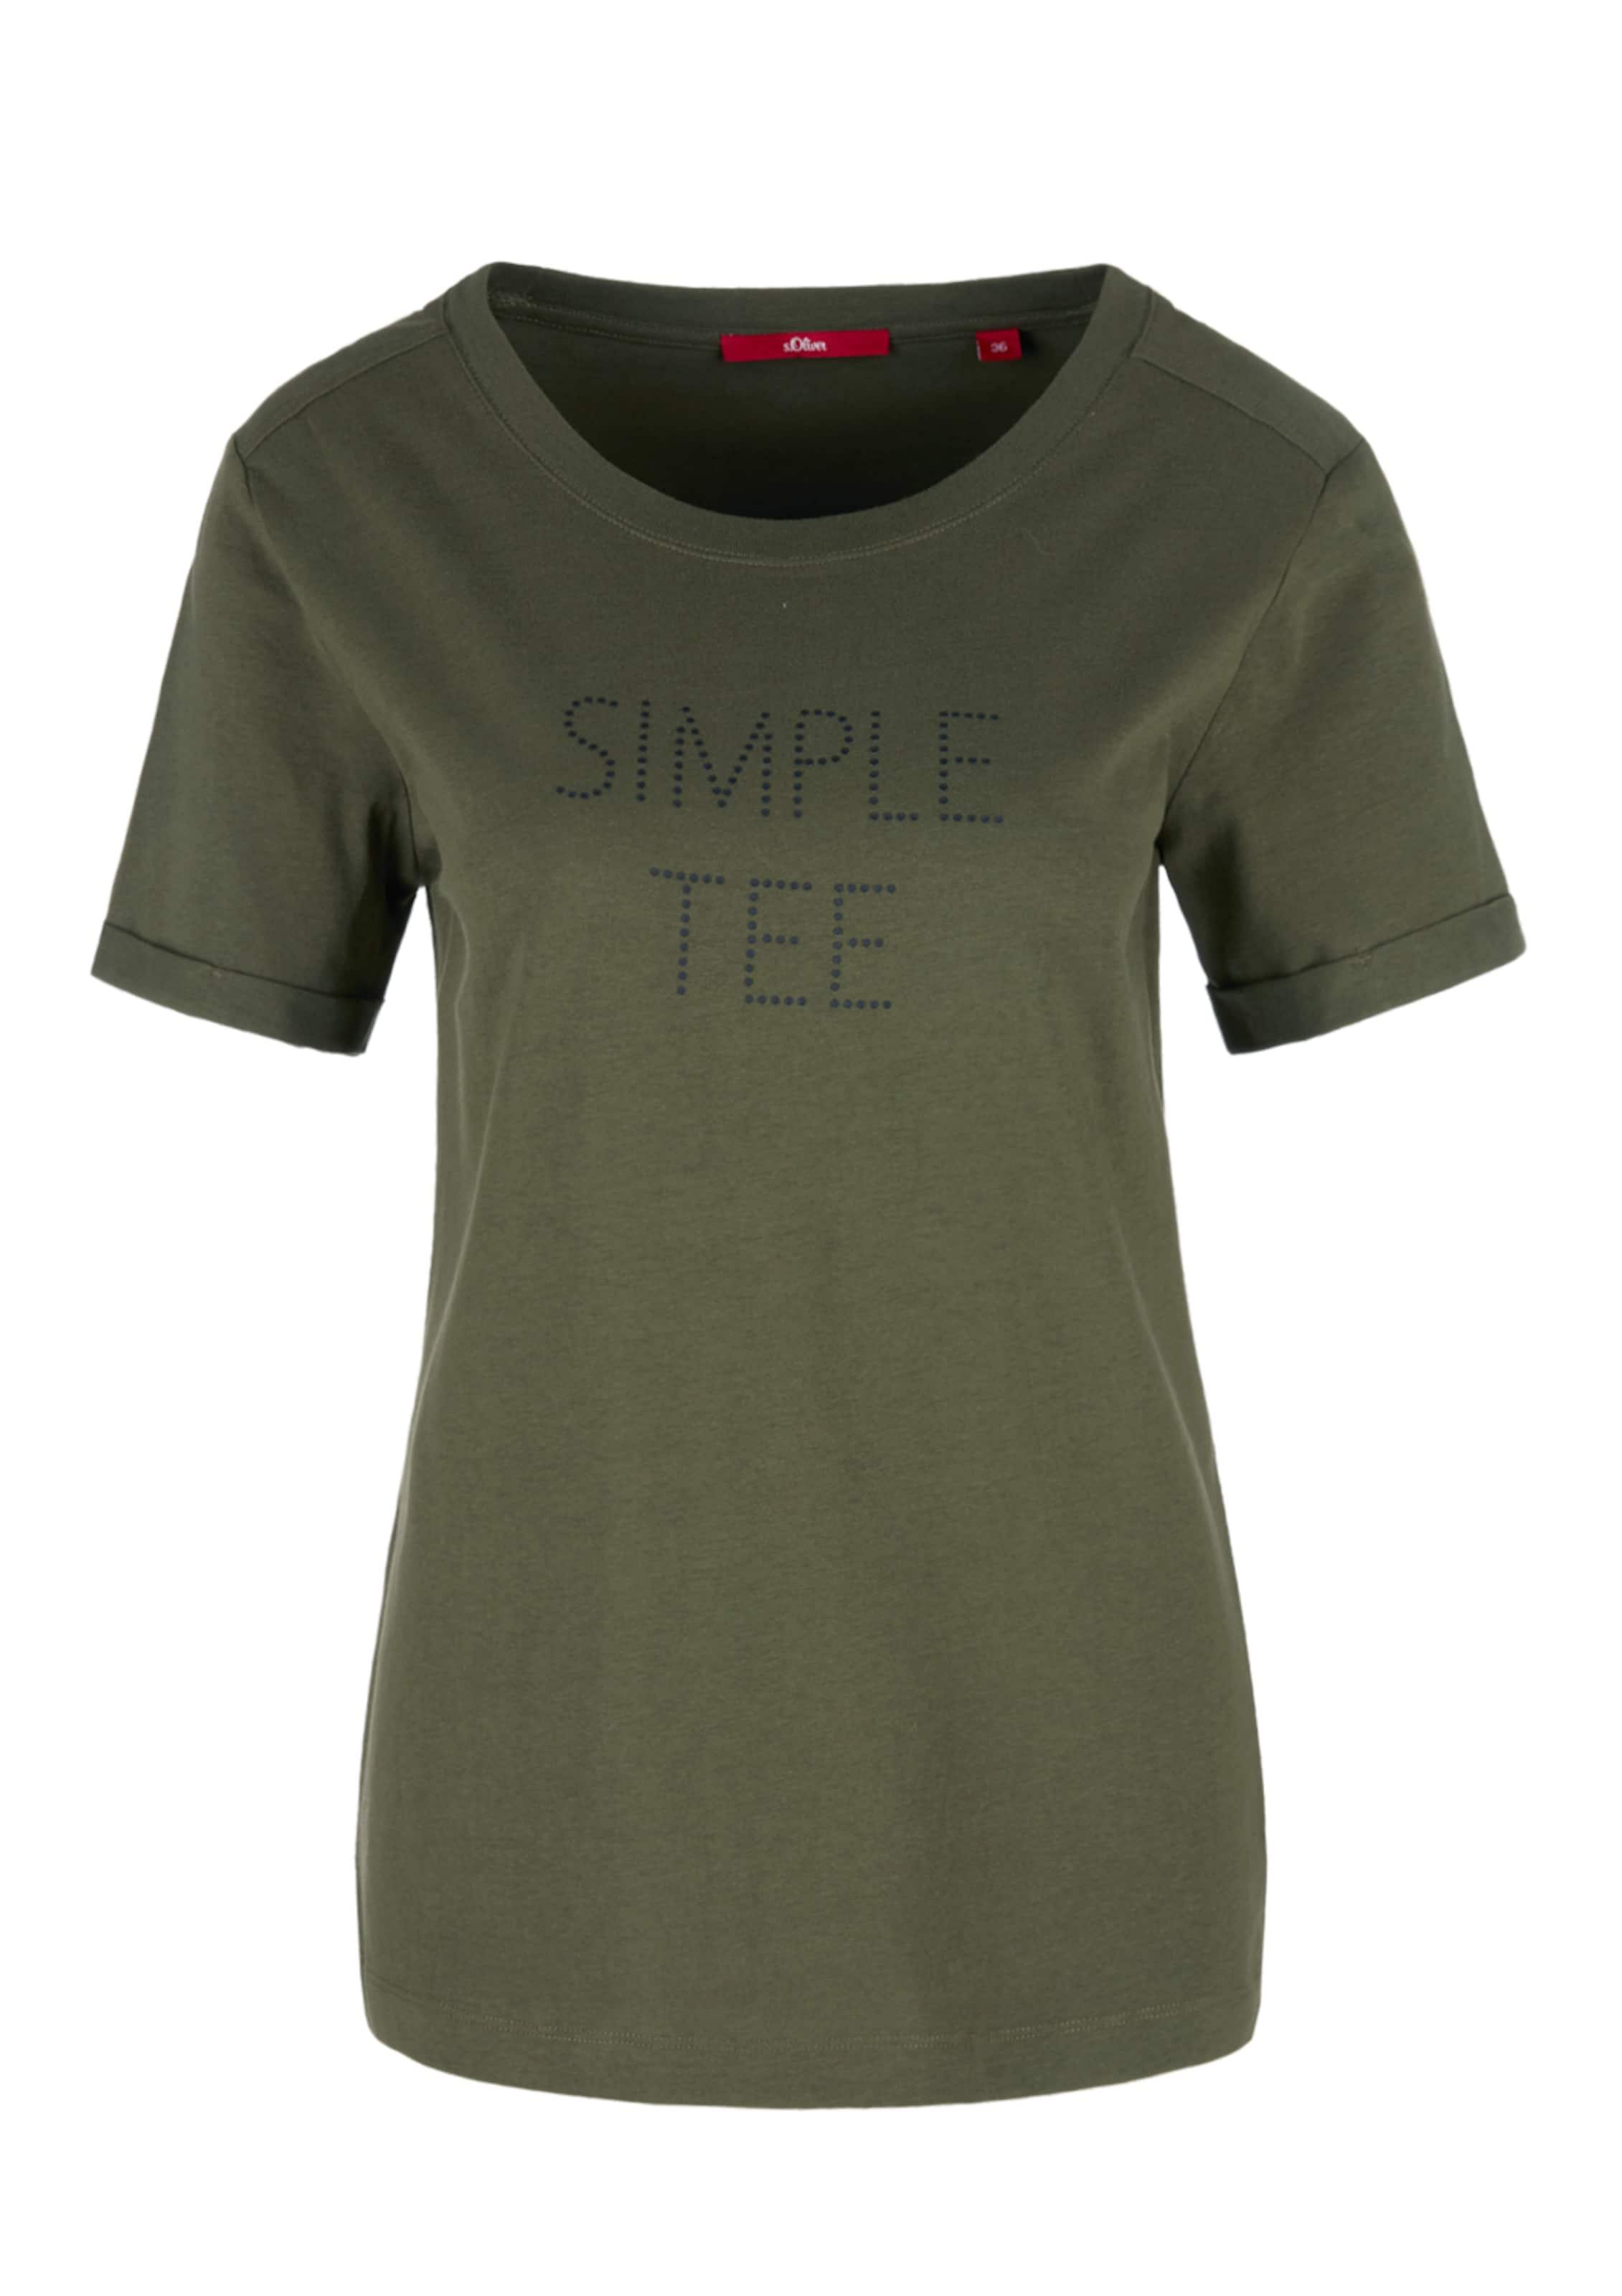 Red oliver Label In Khaki shirt T S rxedBoC